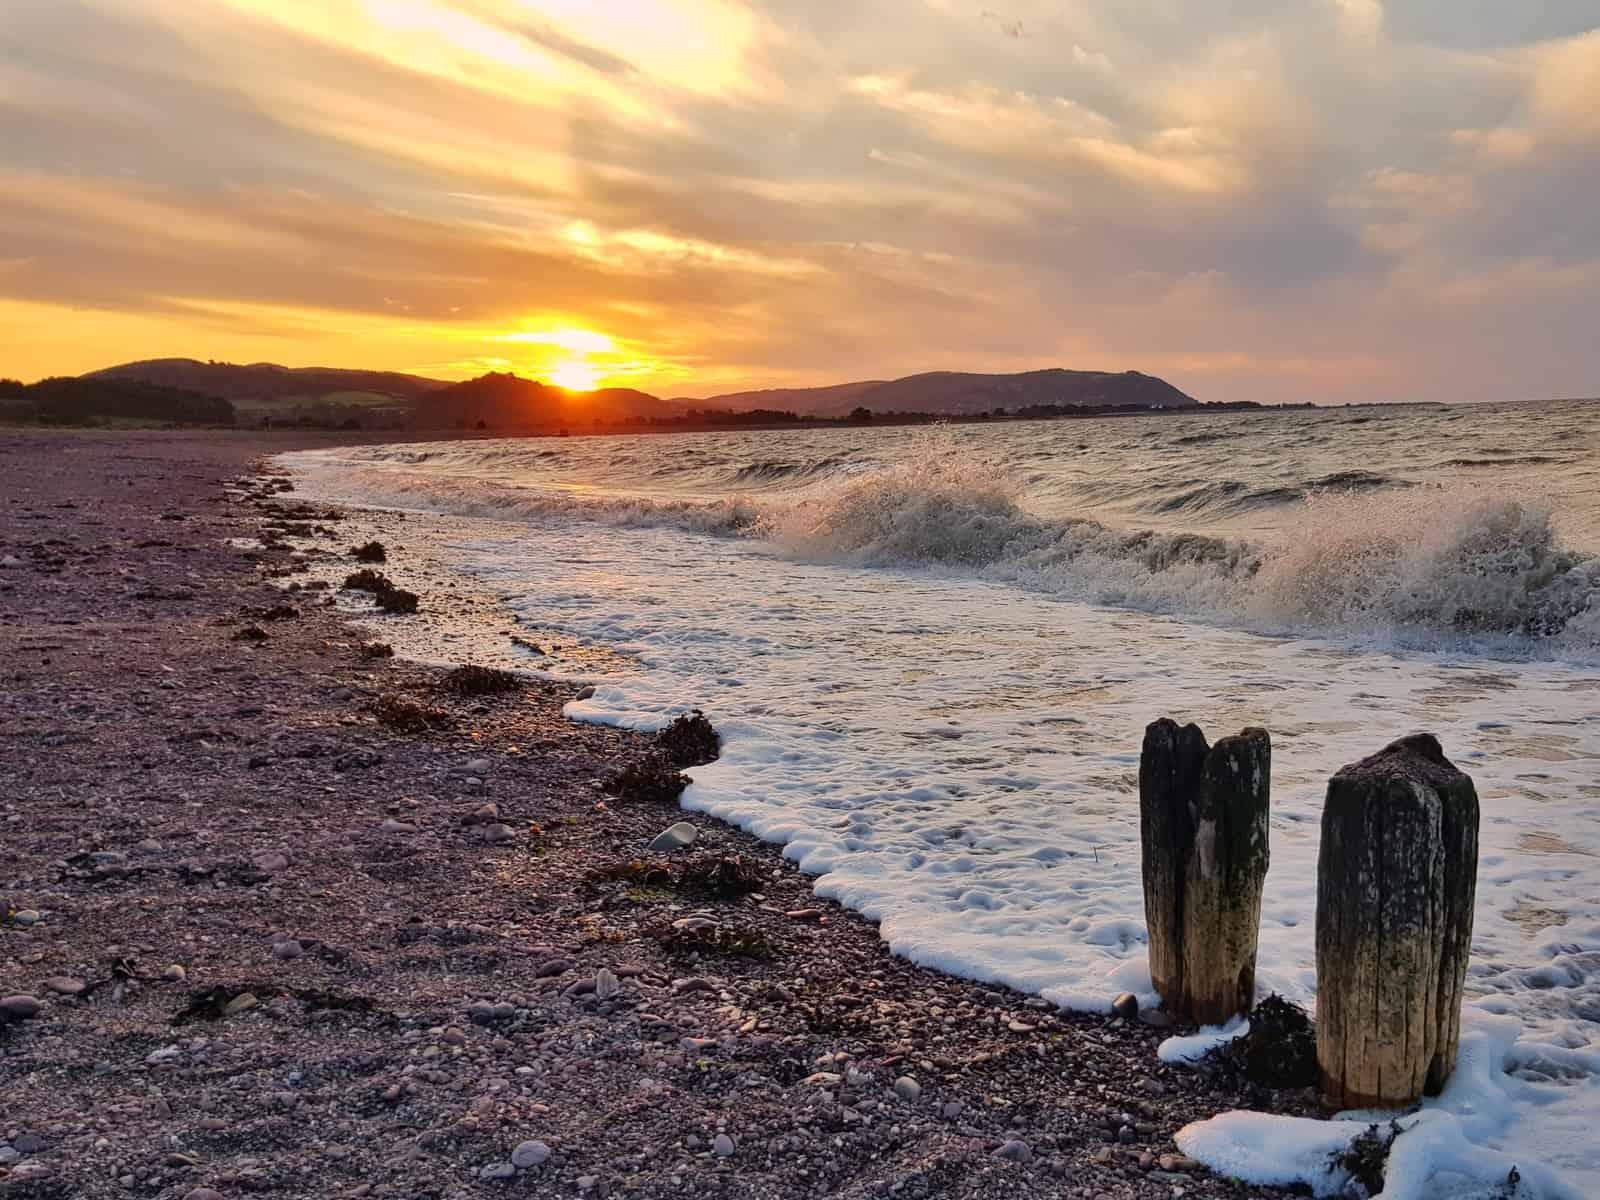 Hoburne Blue Anchor beach at sunset